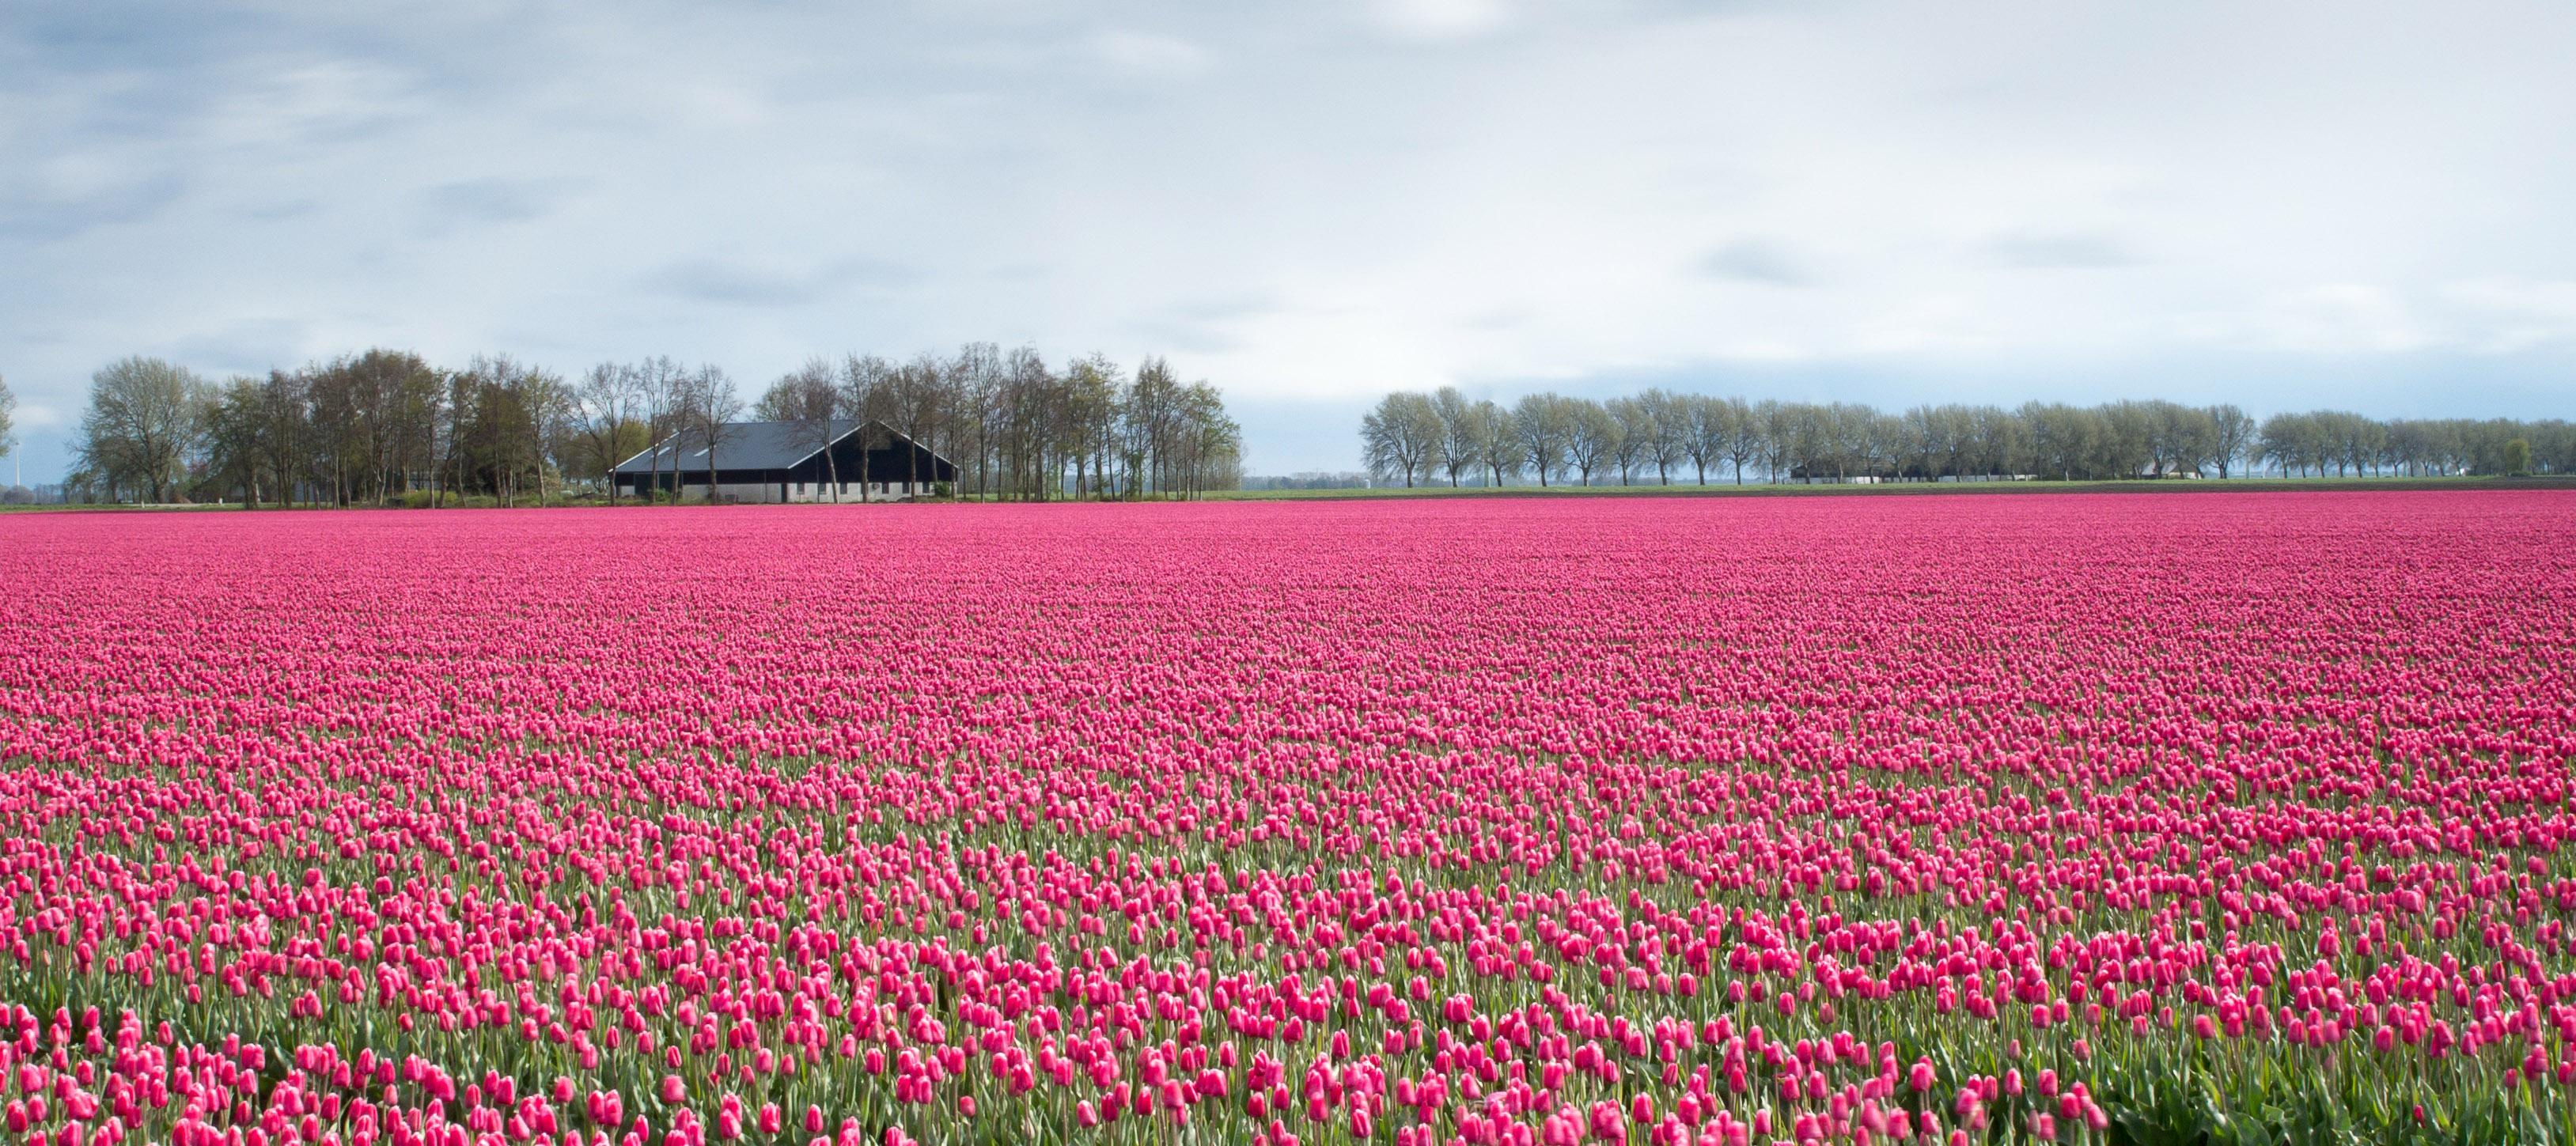 Lelystad Airport, Lelystad, Netherlands - Eddie Hooiveld